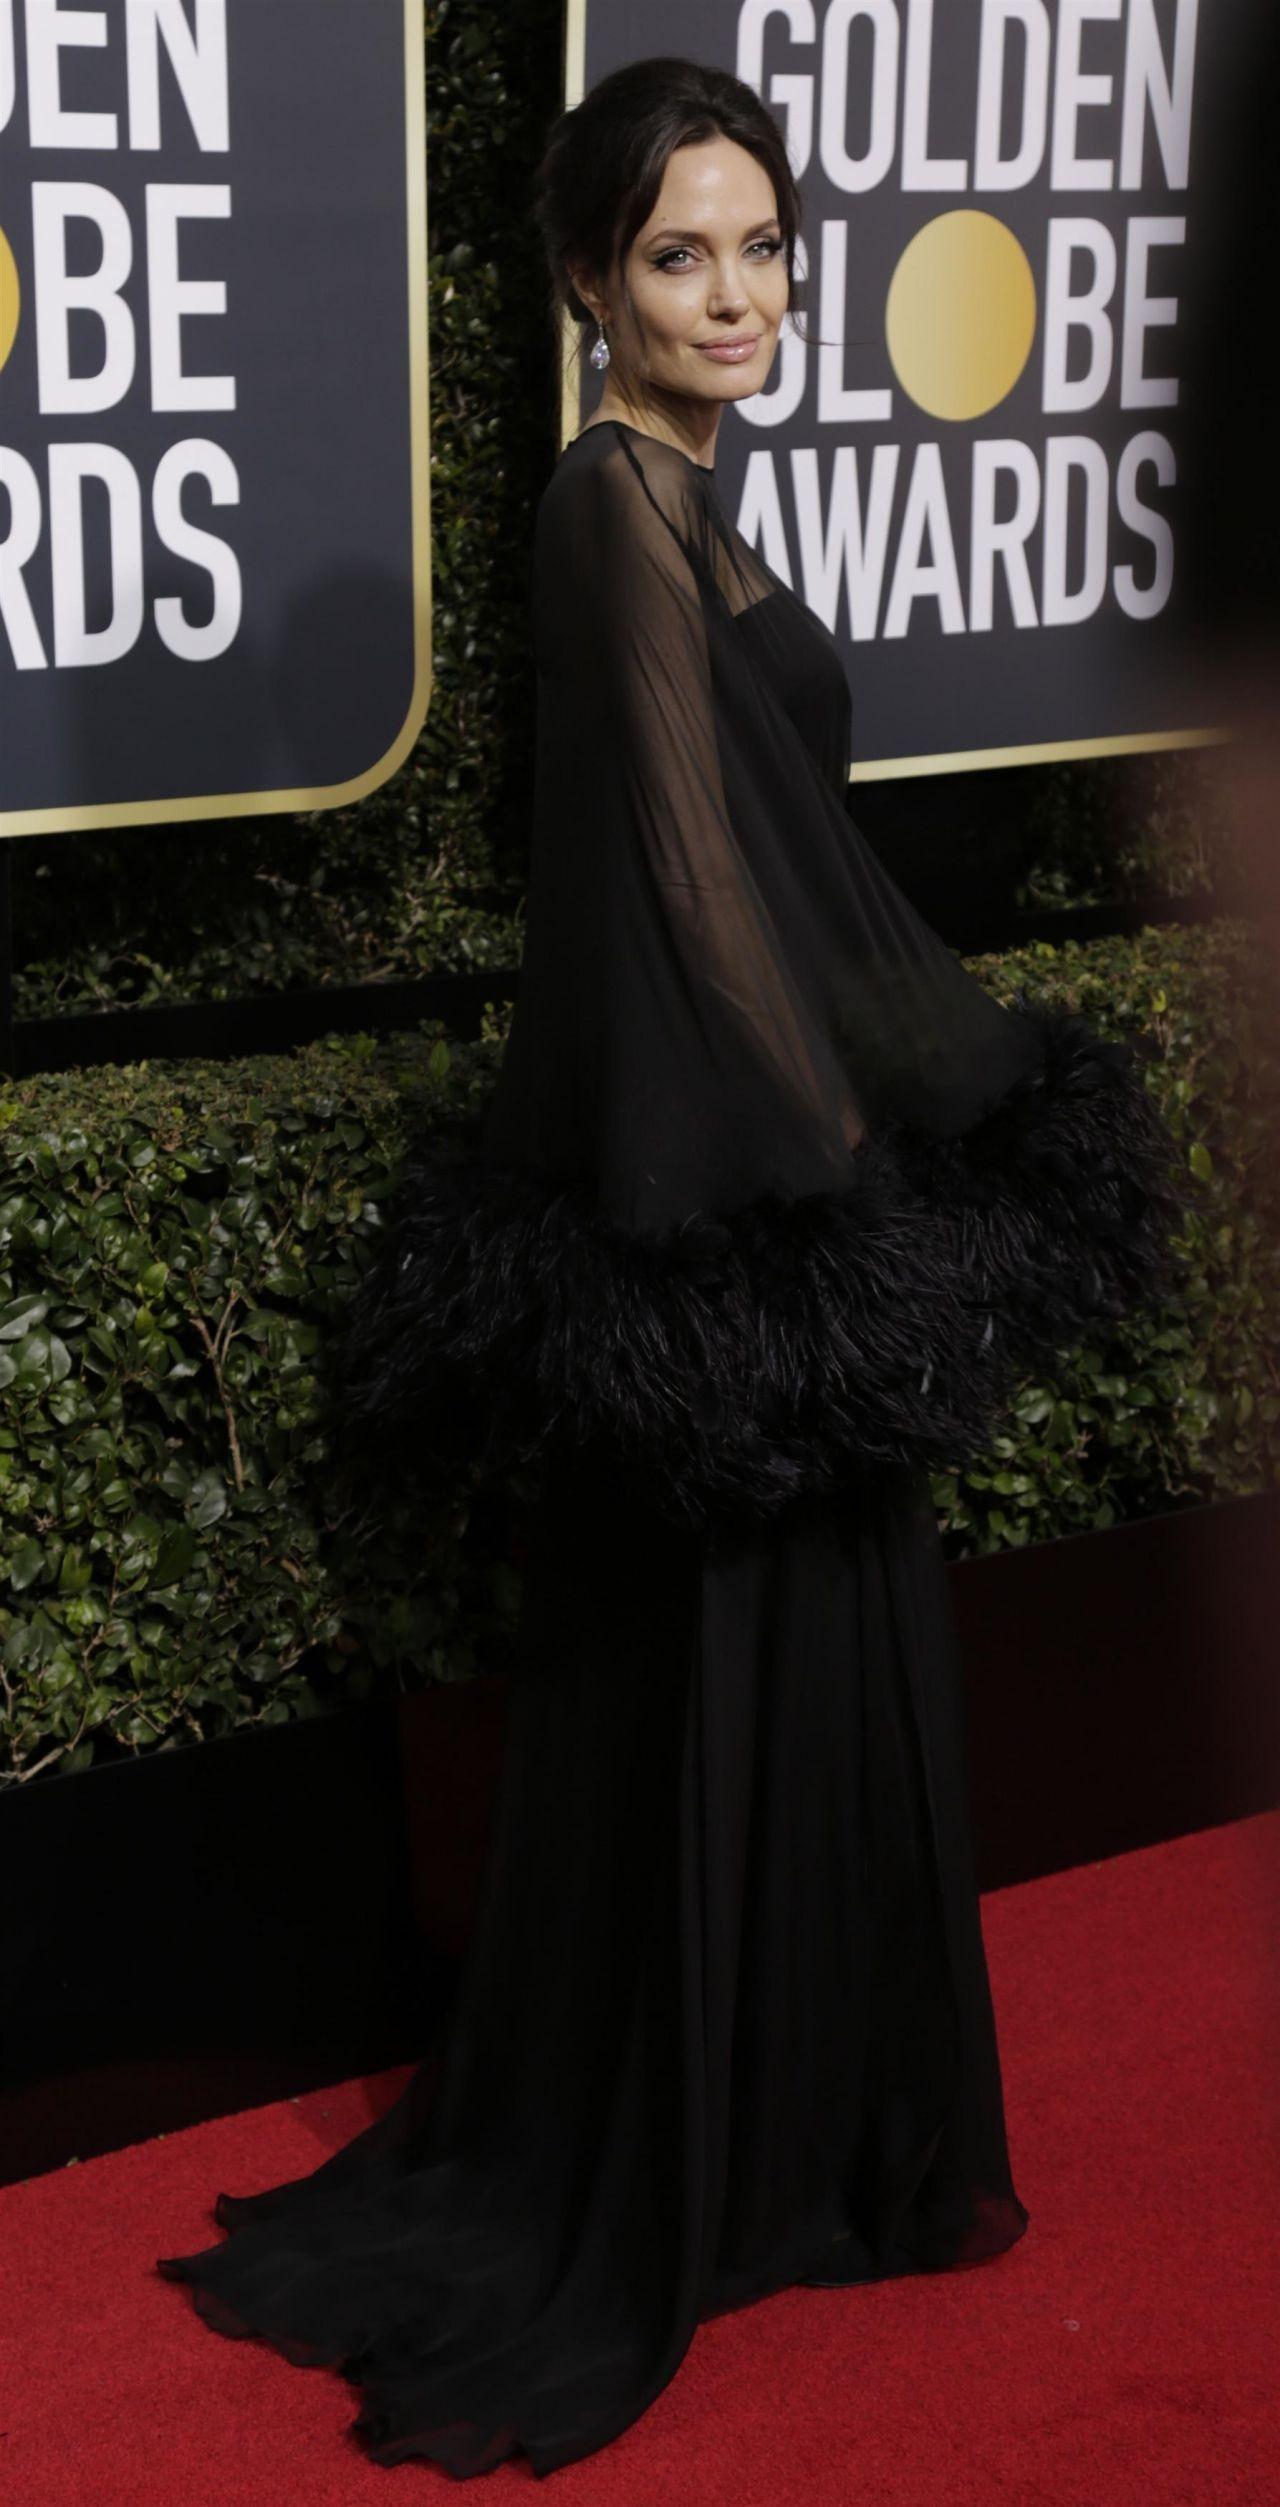 Angelina Jolie – Golden Globe Awards 2018